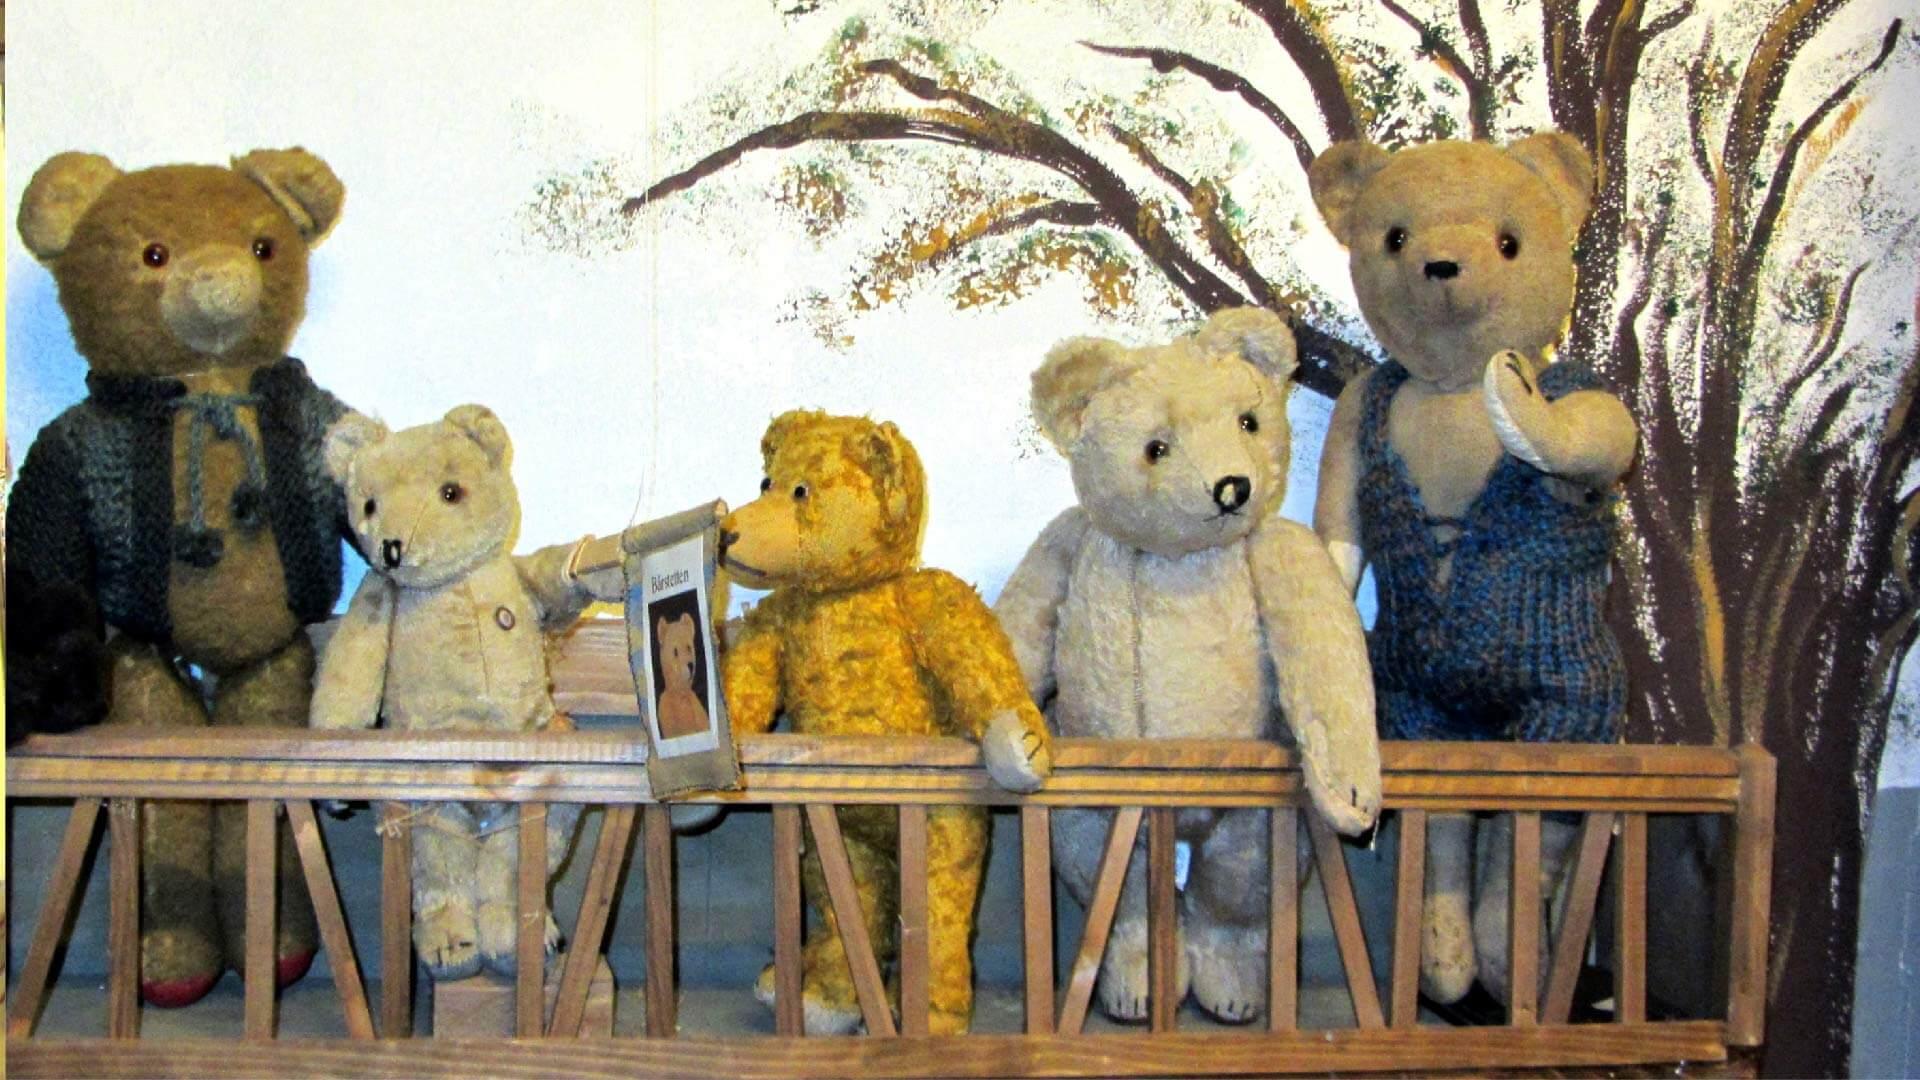 spielzeugmuseum-wattenwil-baeren-familie